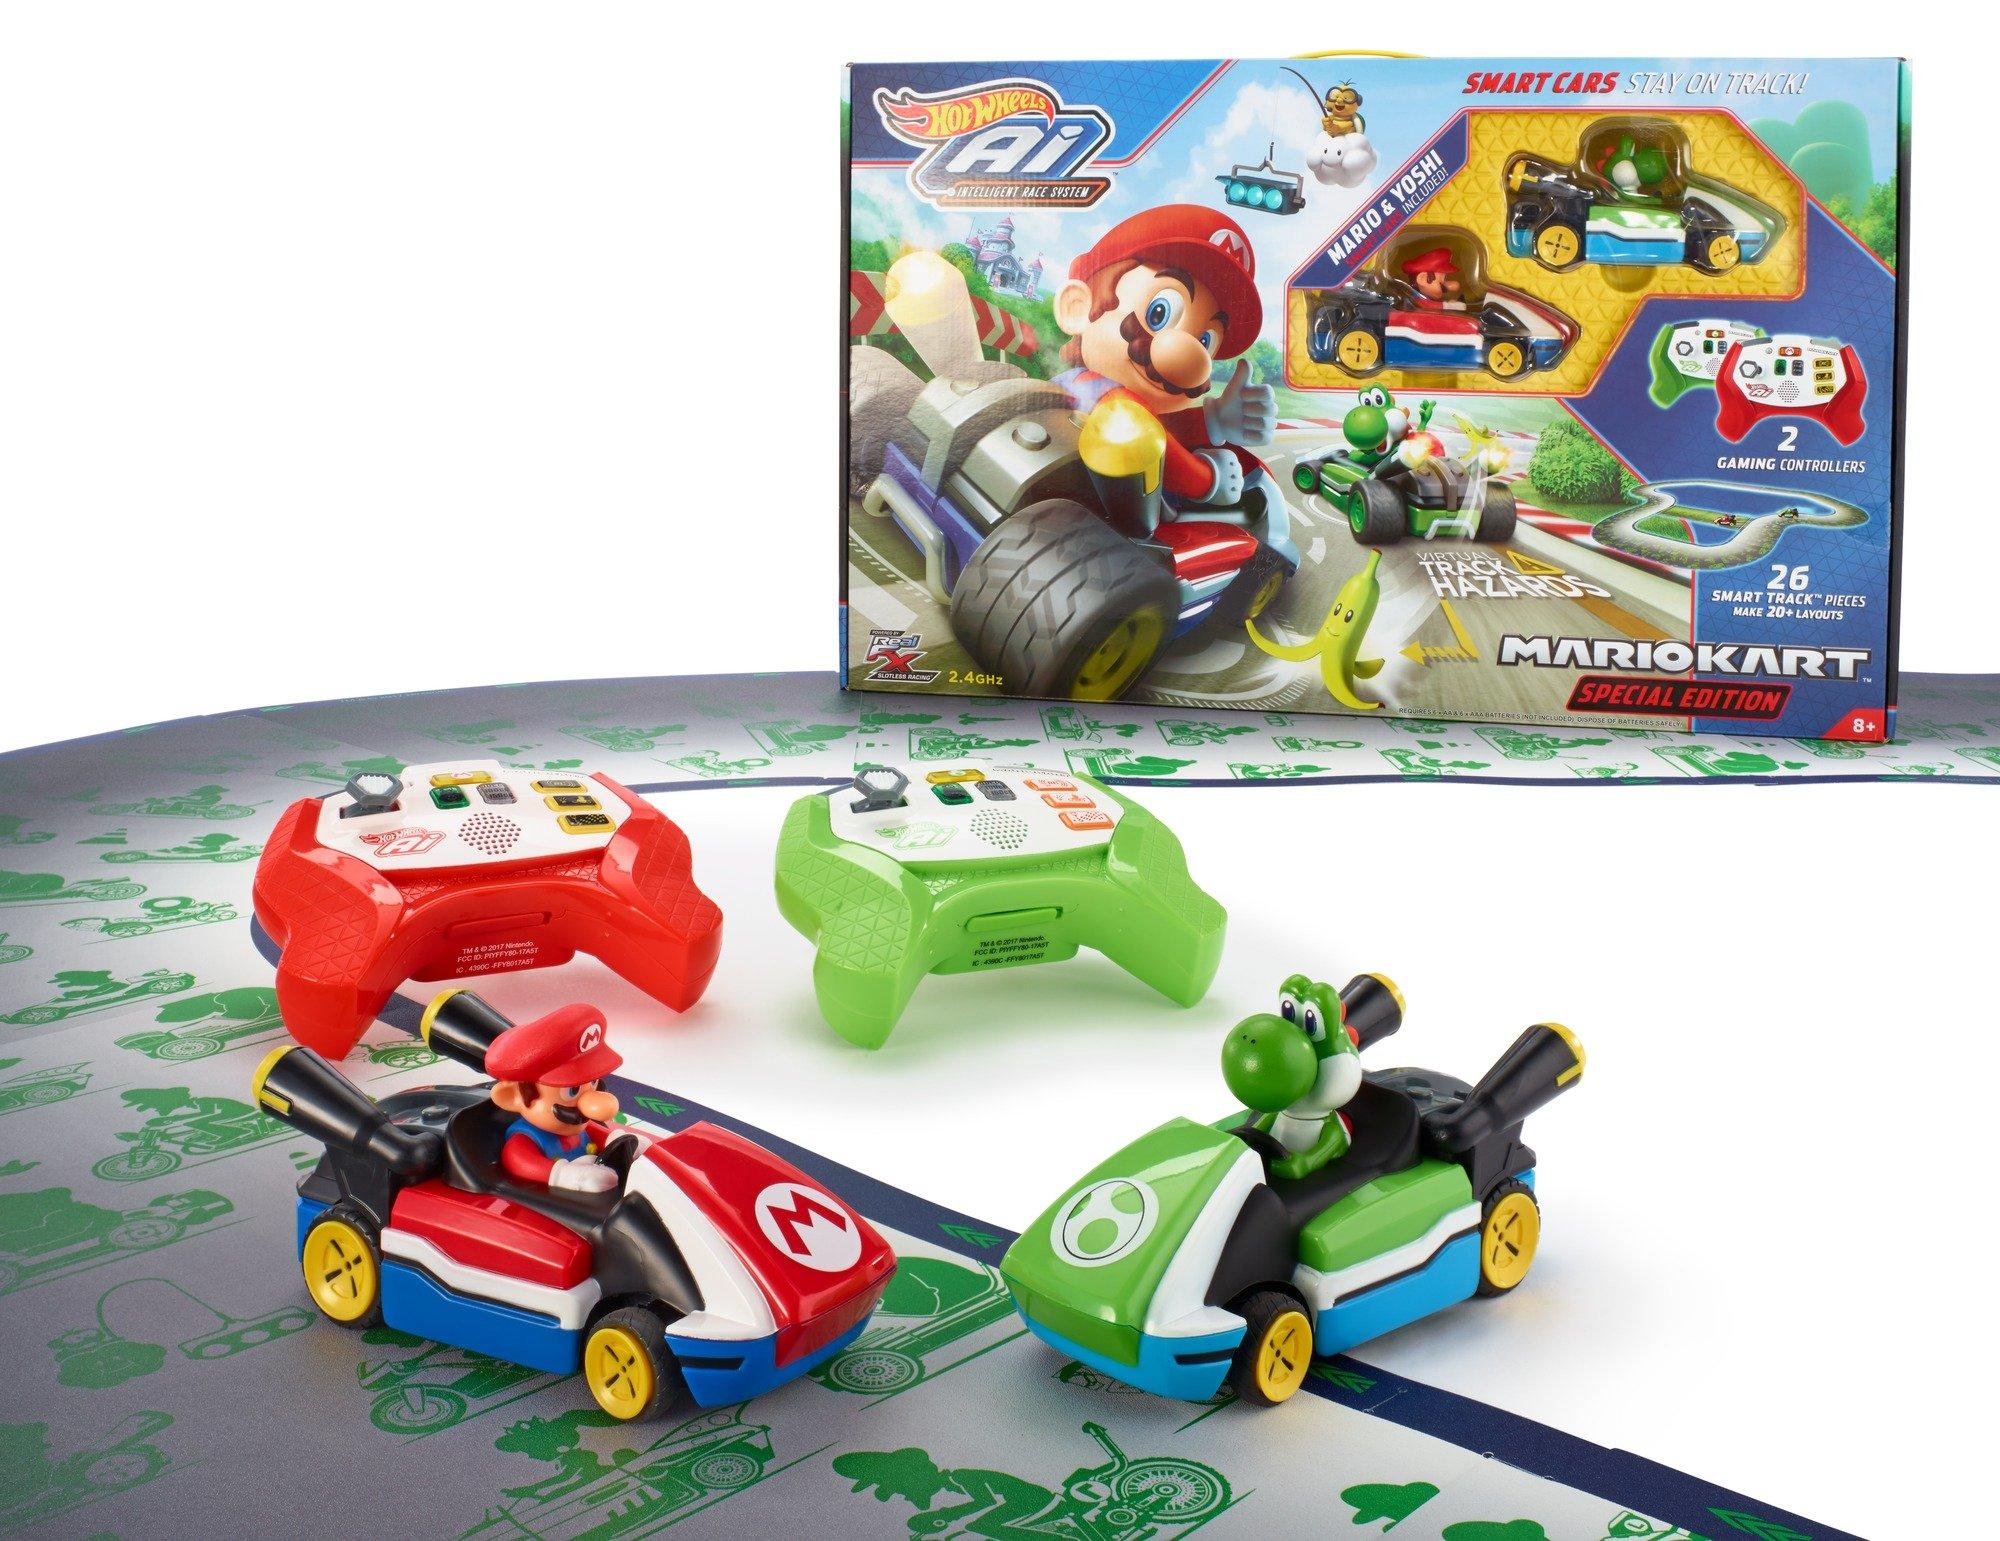 Hot Wheels Ai Starter Set Mario Kart Edition Track Set